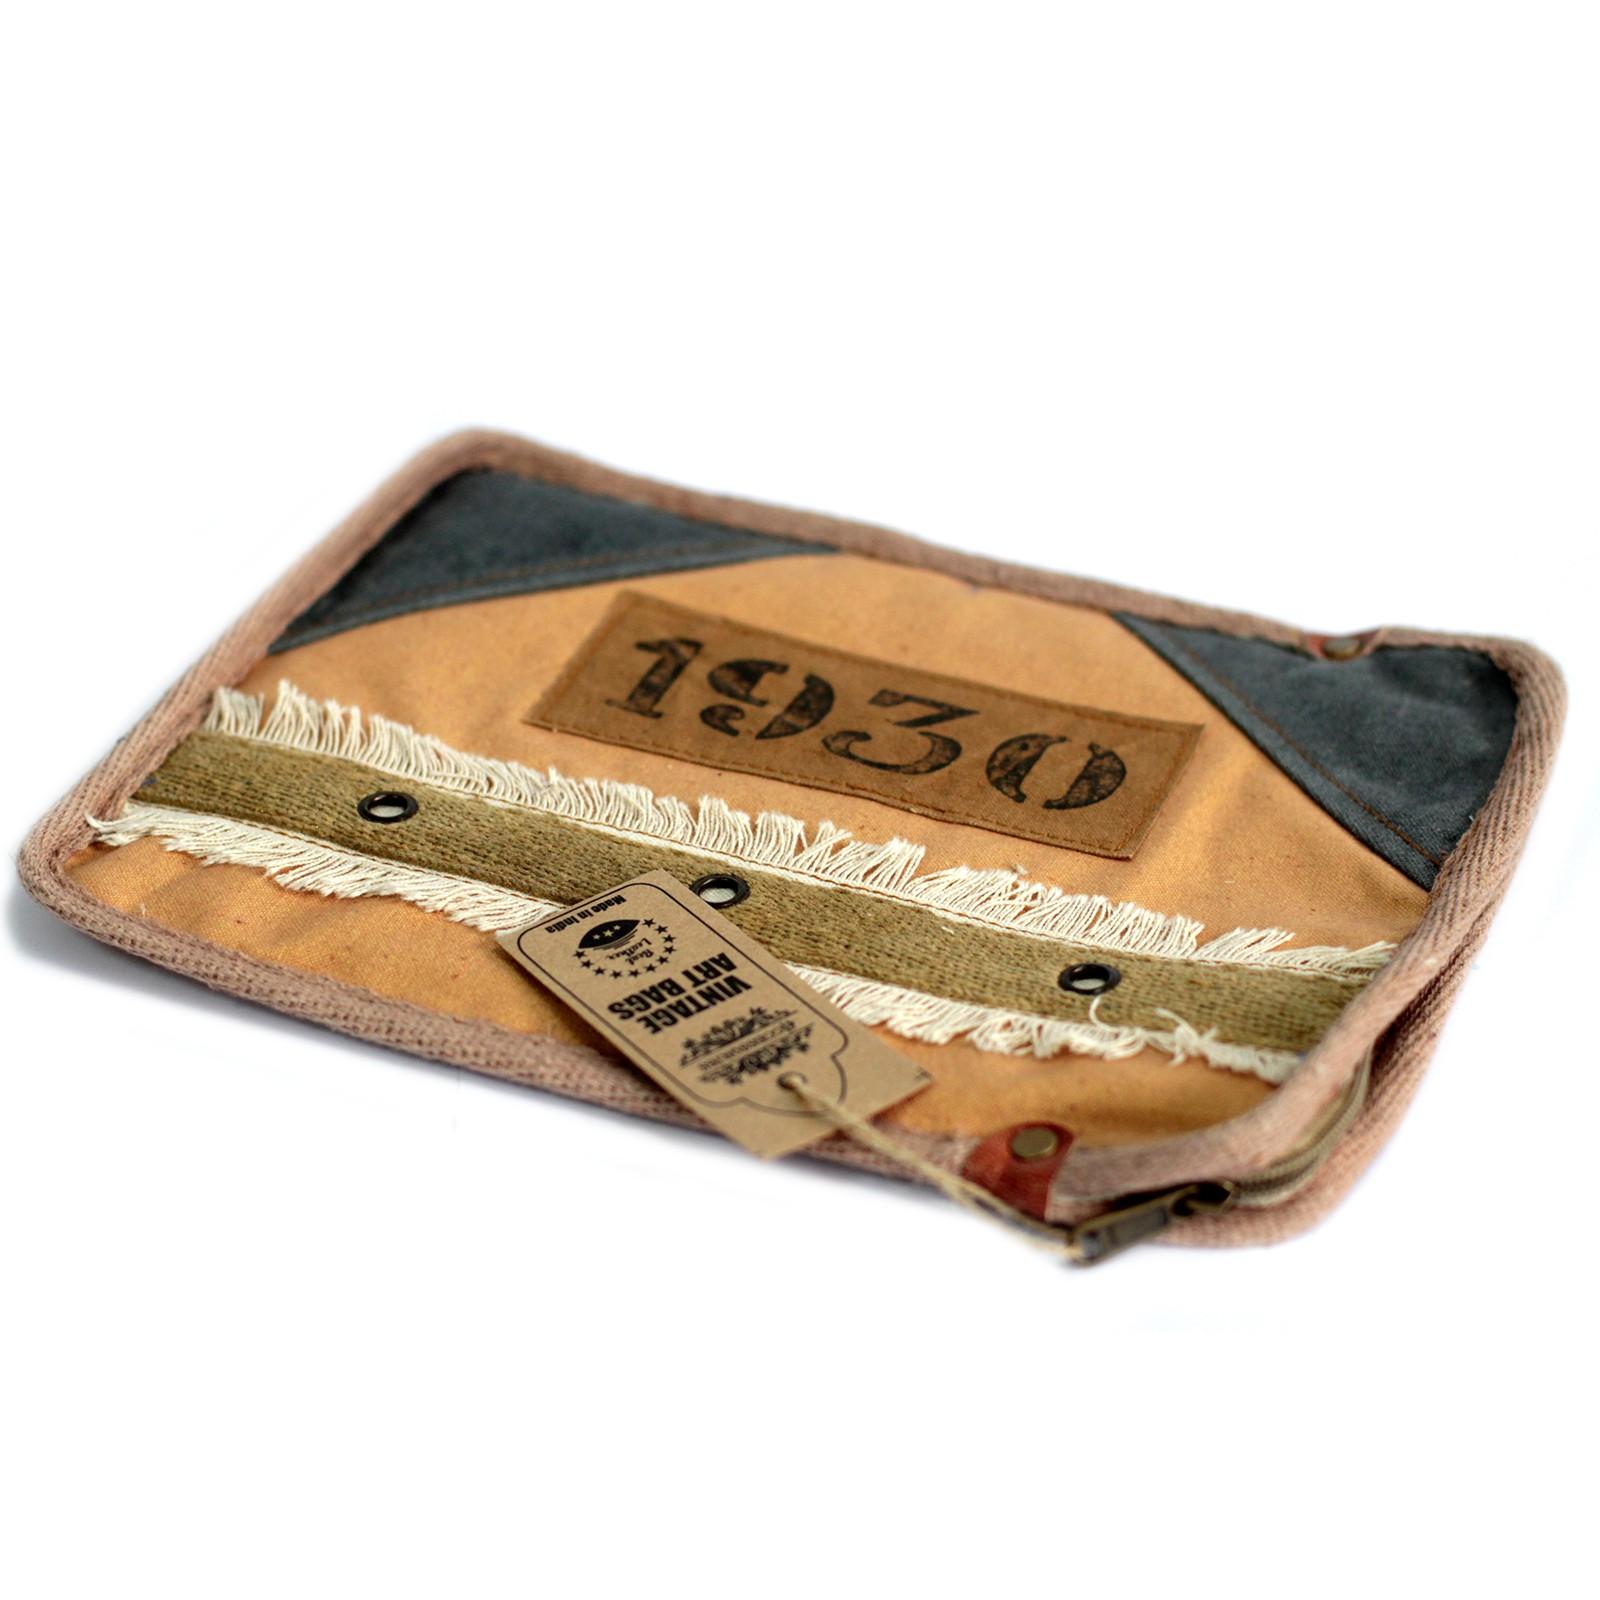 Vintage Bag - Tablet Pouch-1930